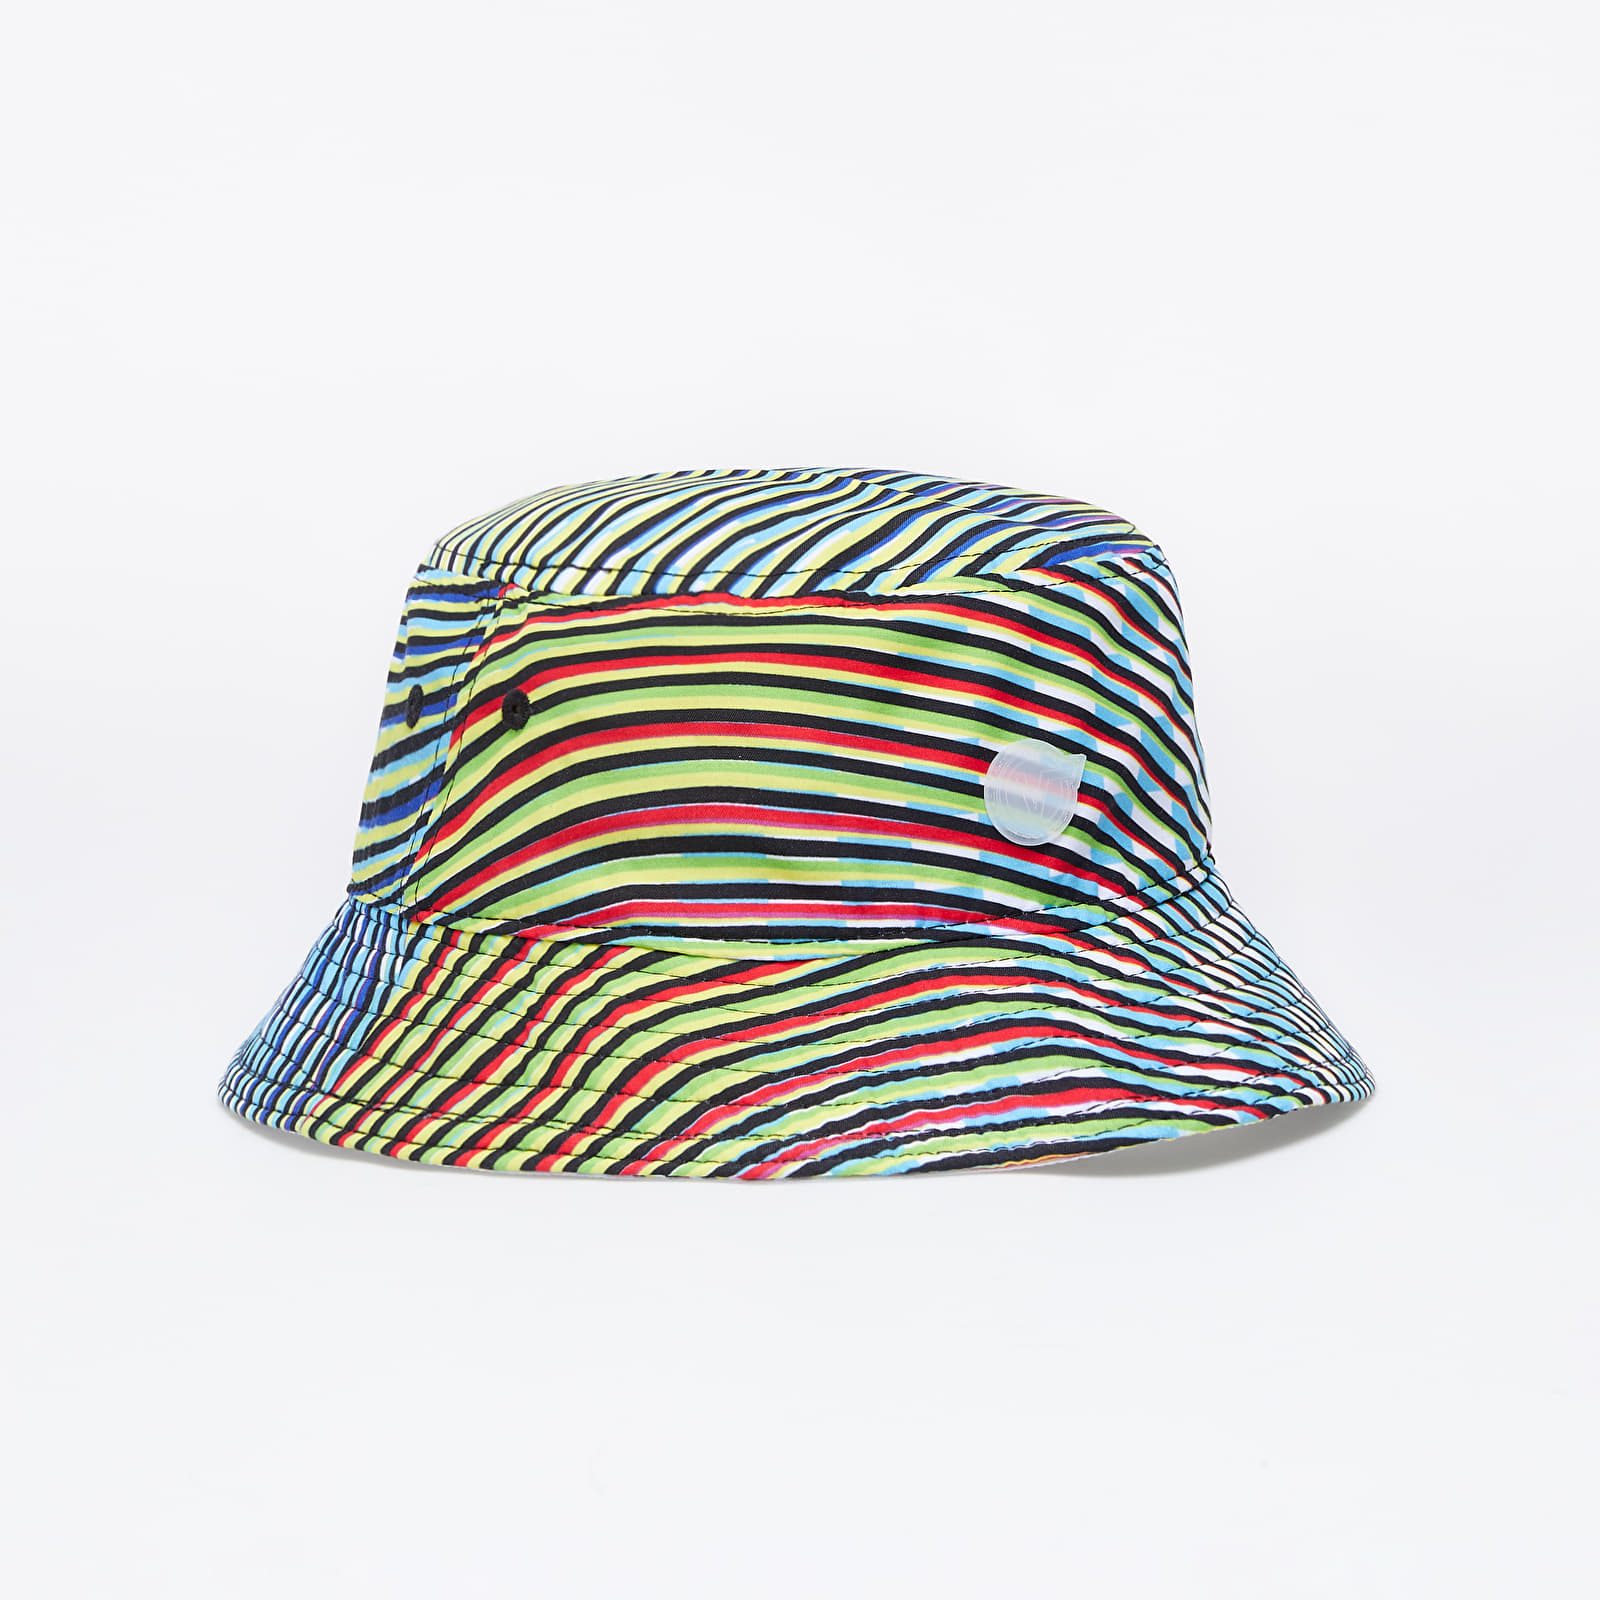 Klobouky Vans x Anderson Paak Venice Bucket Hat (Anderson Paak)